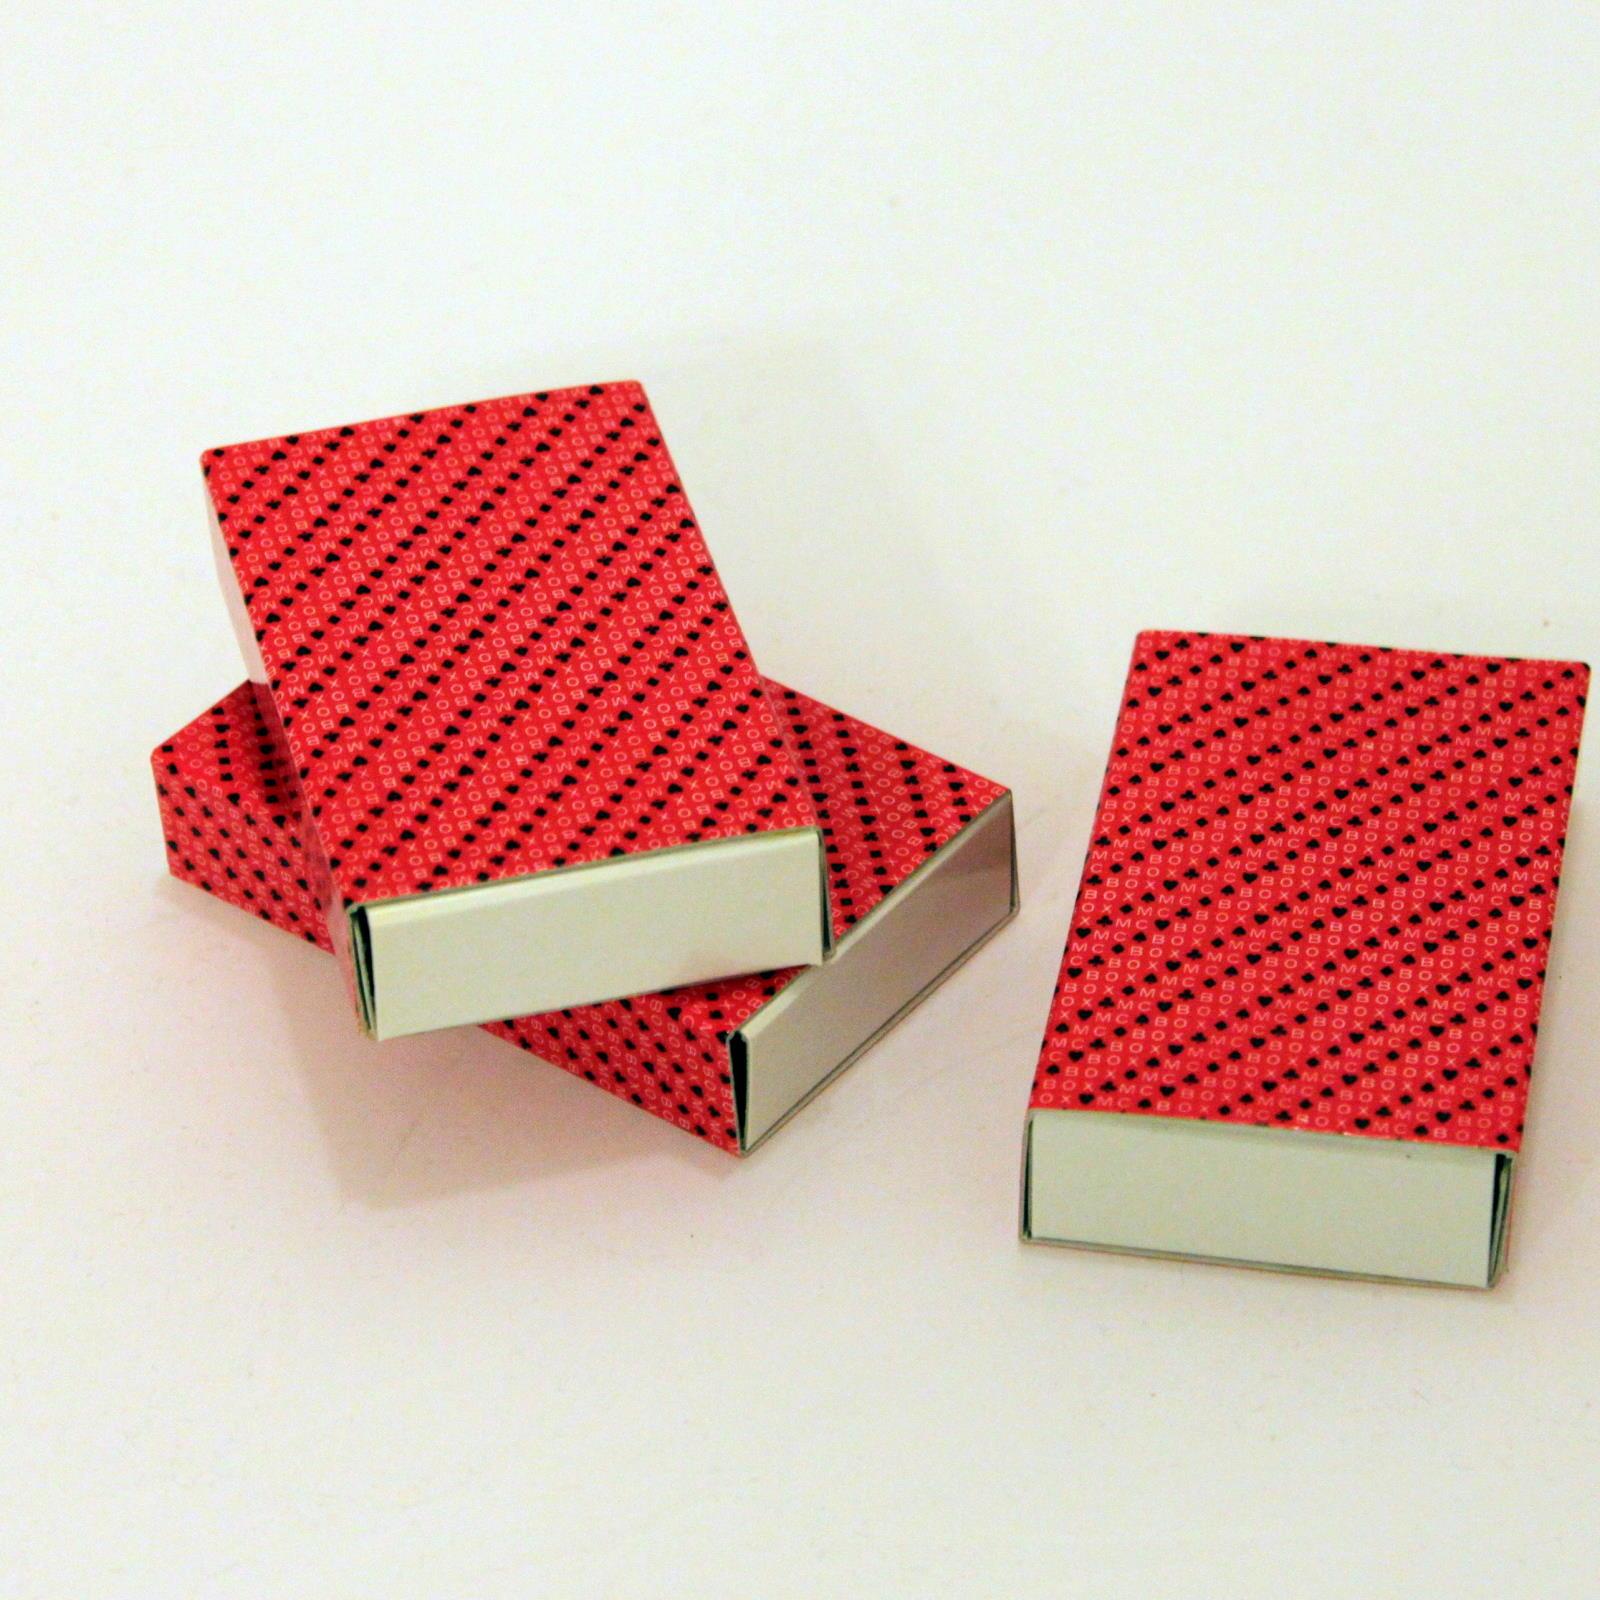 MC Box by Mikame Craft